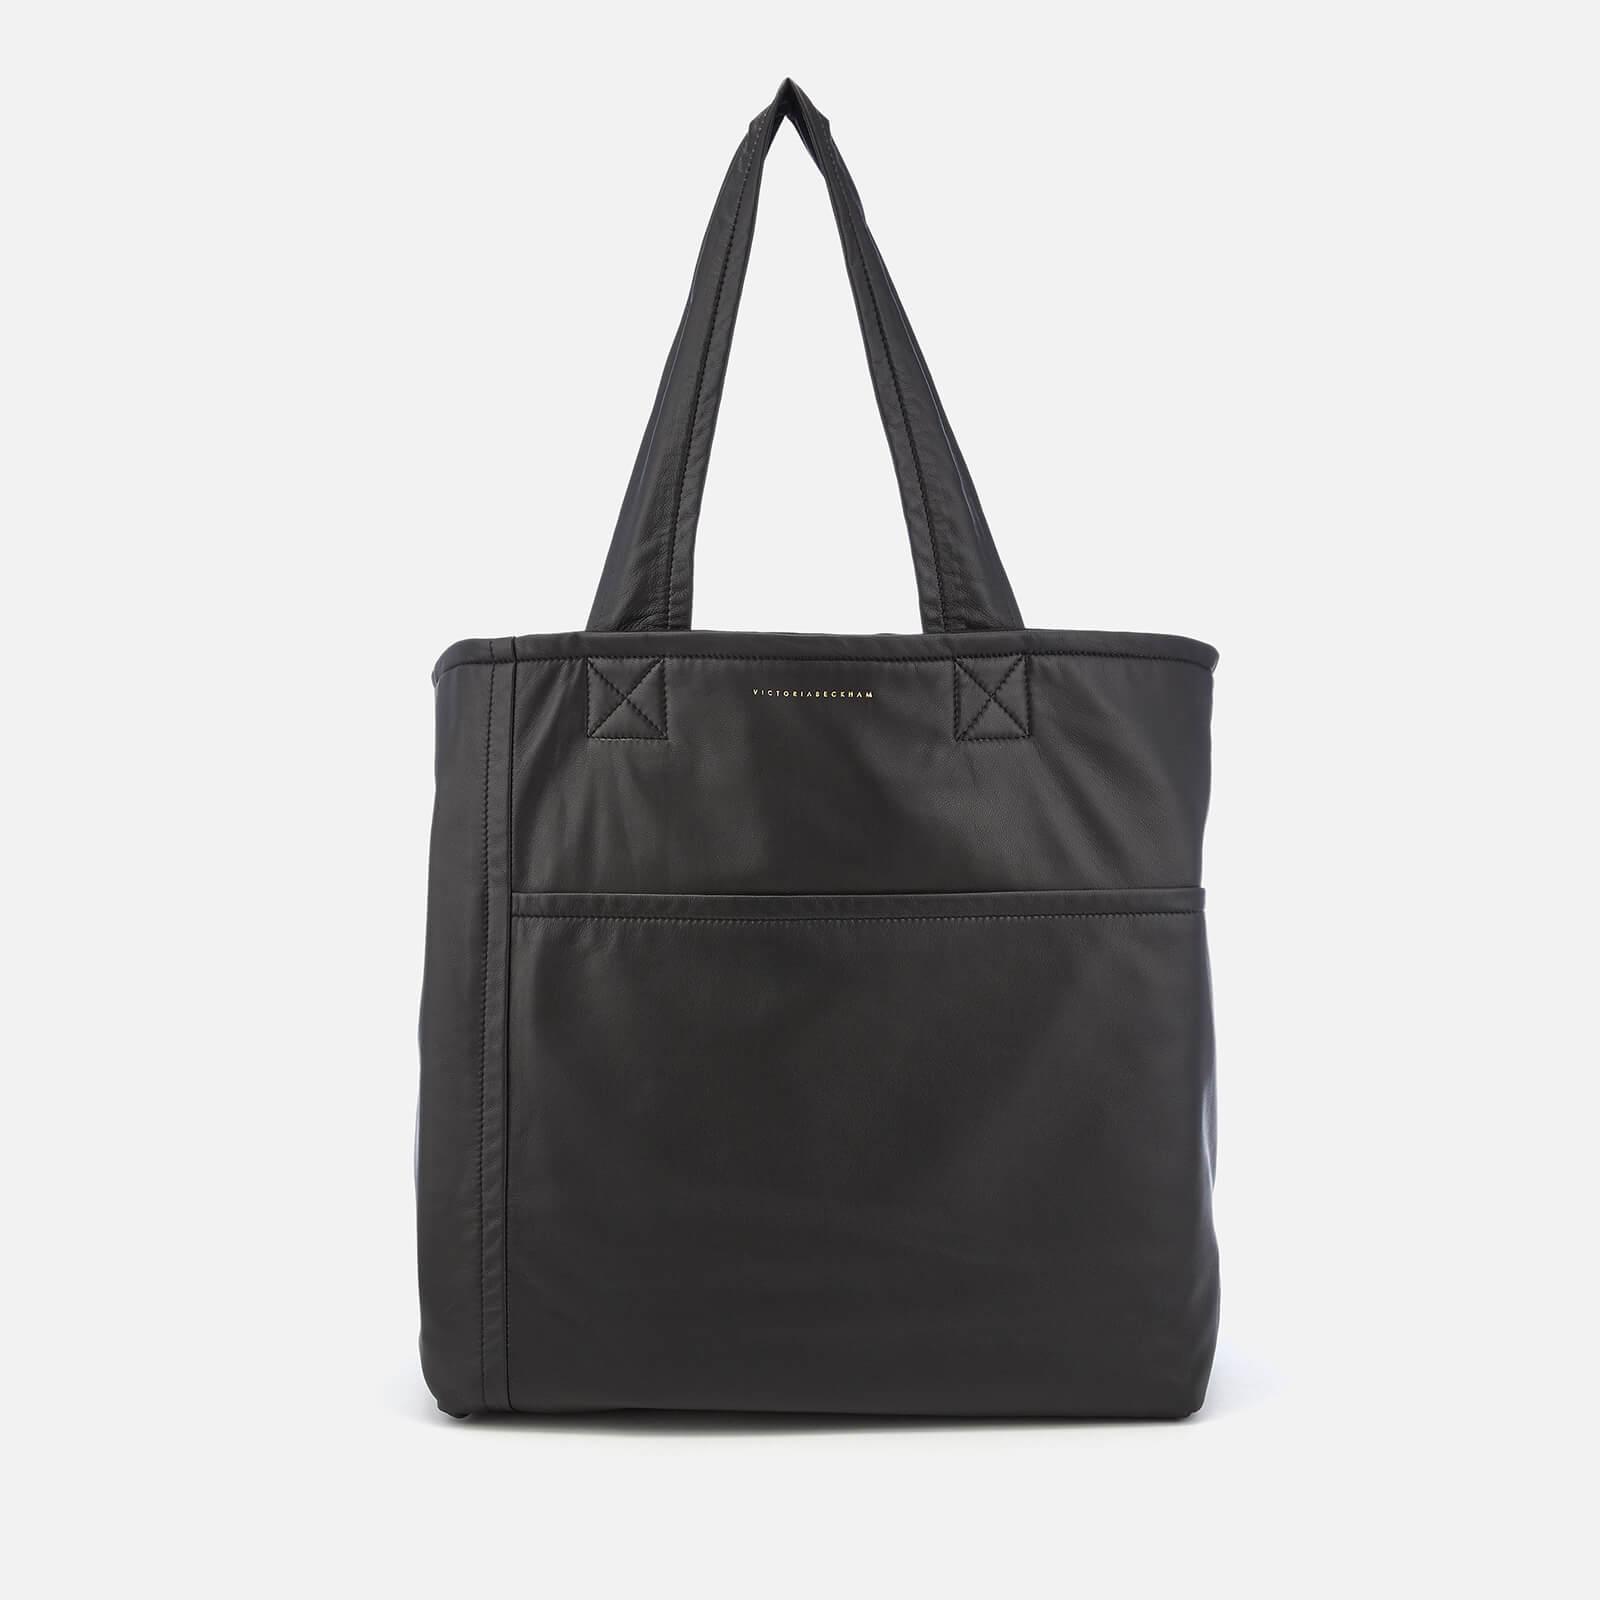 49482a81e2 Victoria Beckham Women s Sunday Bag - Black - Free UK Delivery over £50